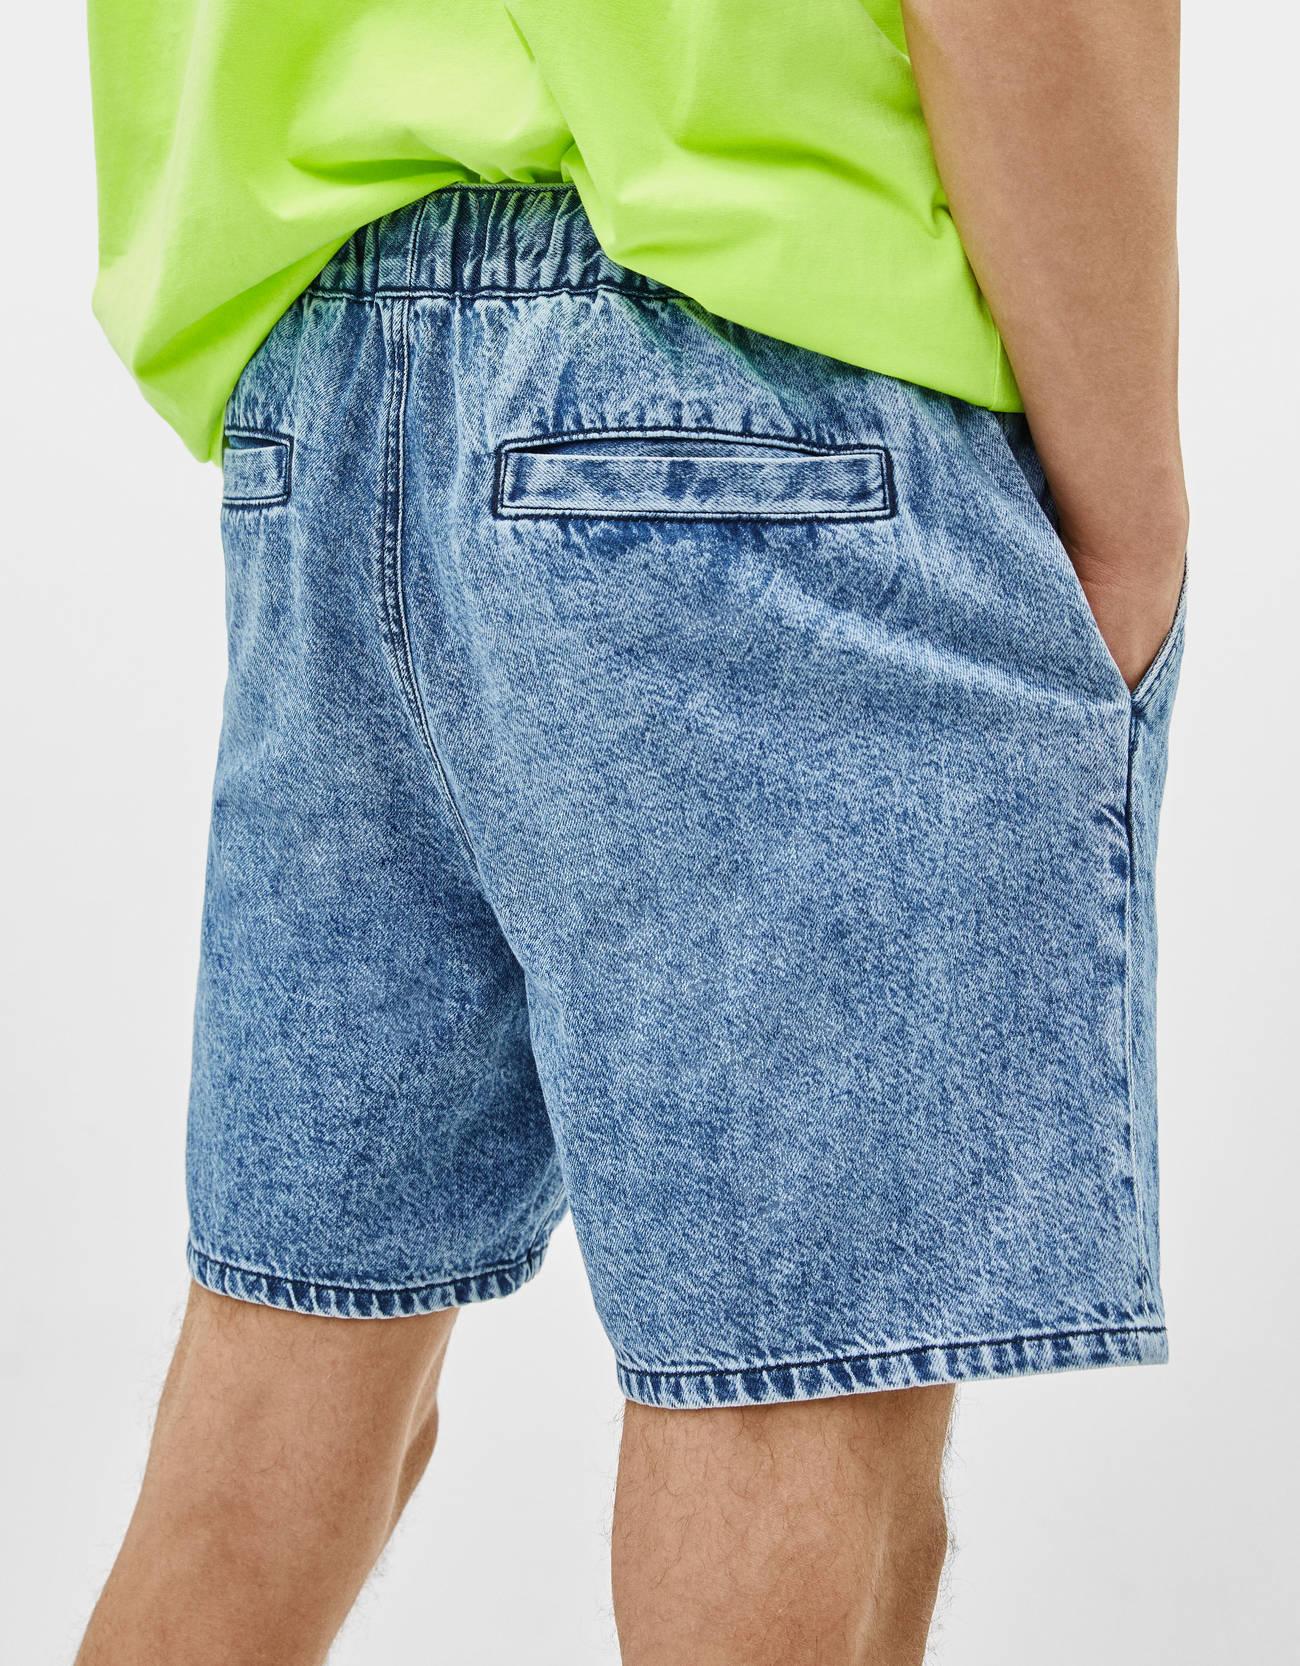 e43e1aa0396 Denim Bermuda shorts with a stretch waistband. - Shoes - Bershka Poland